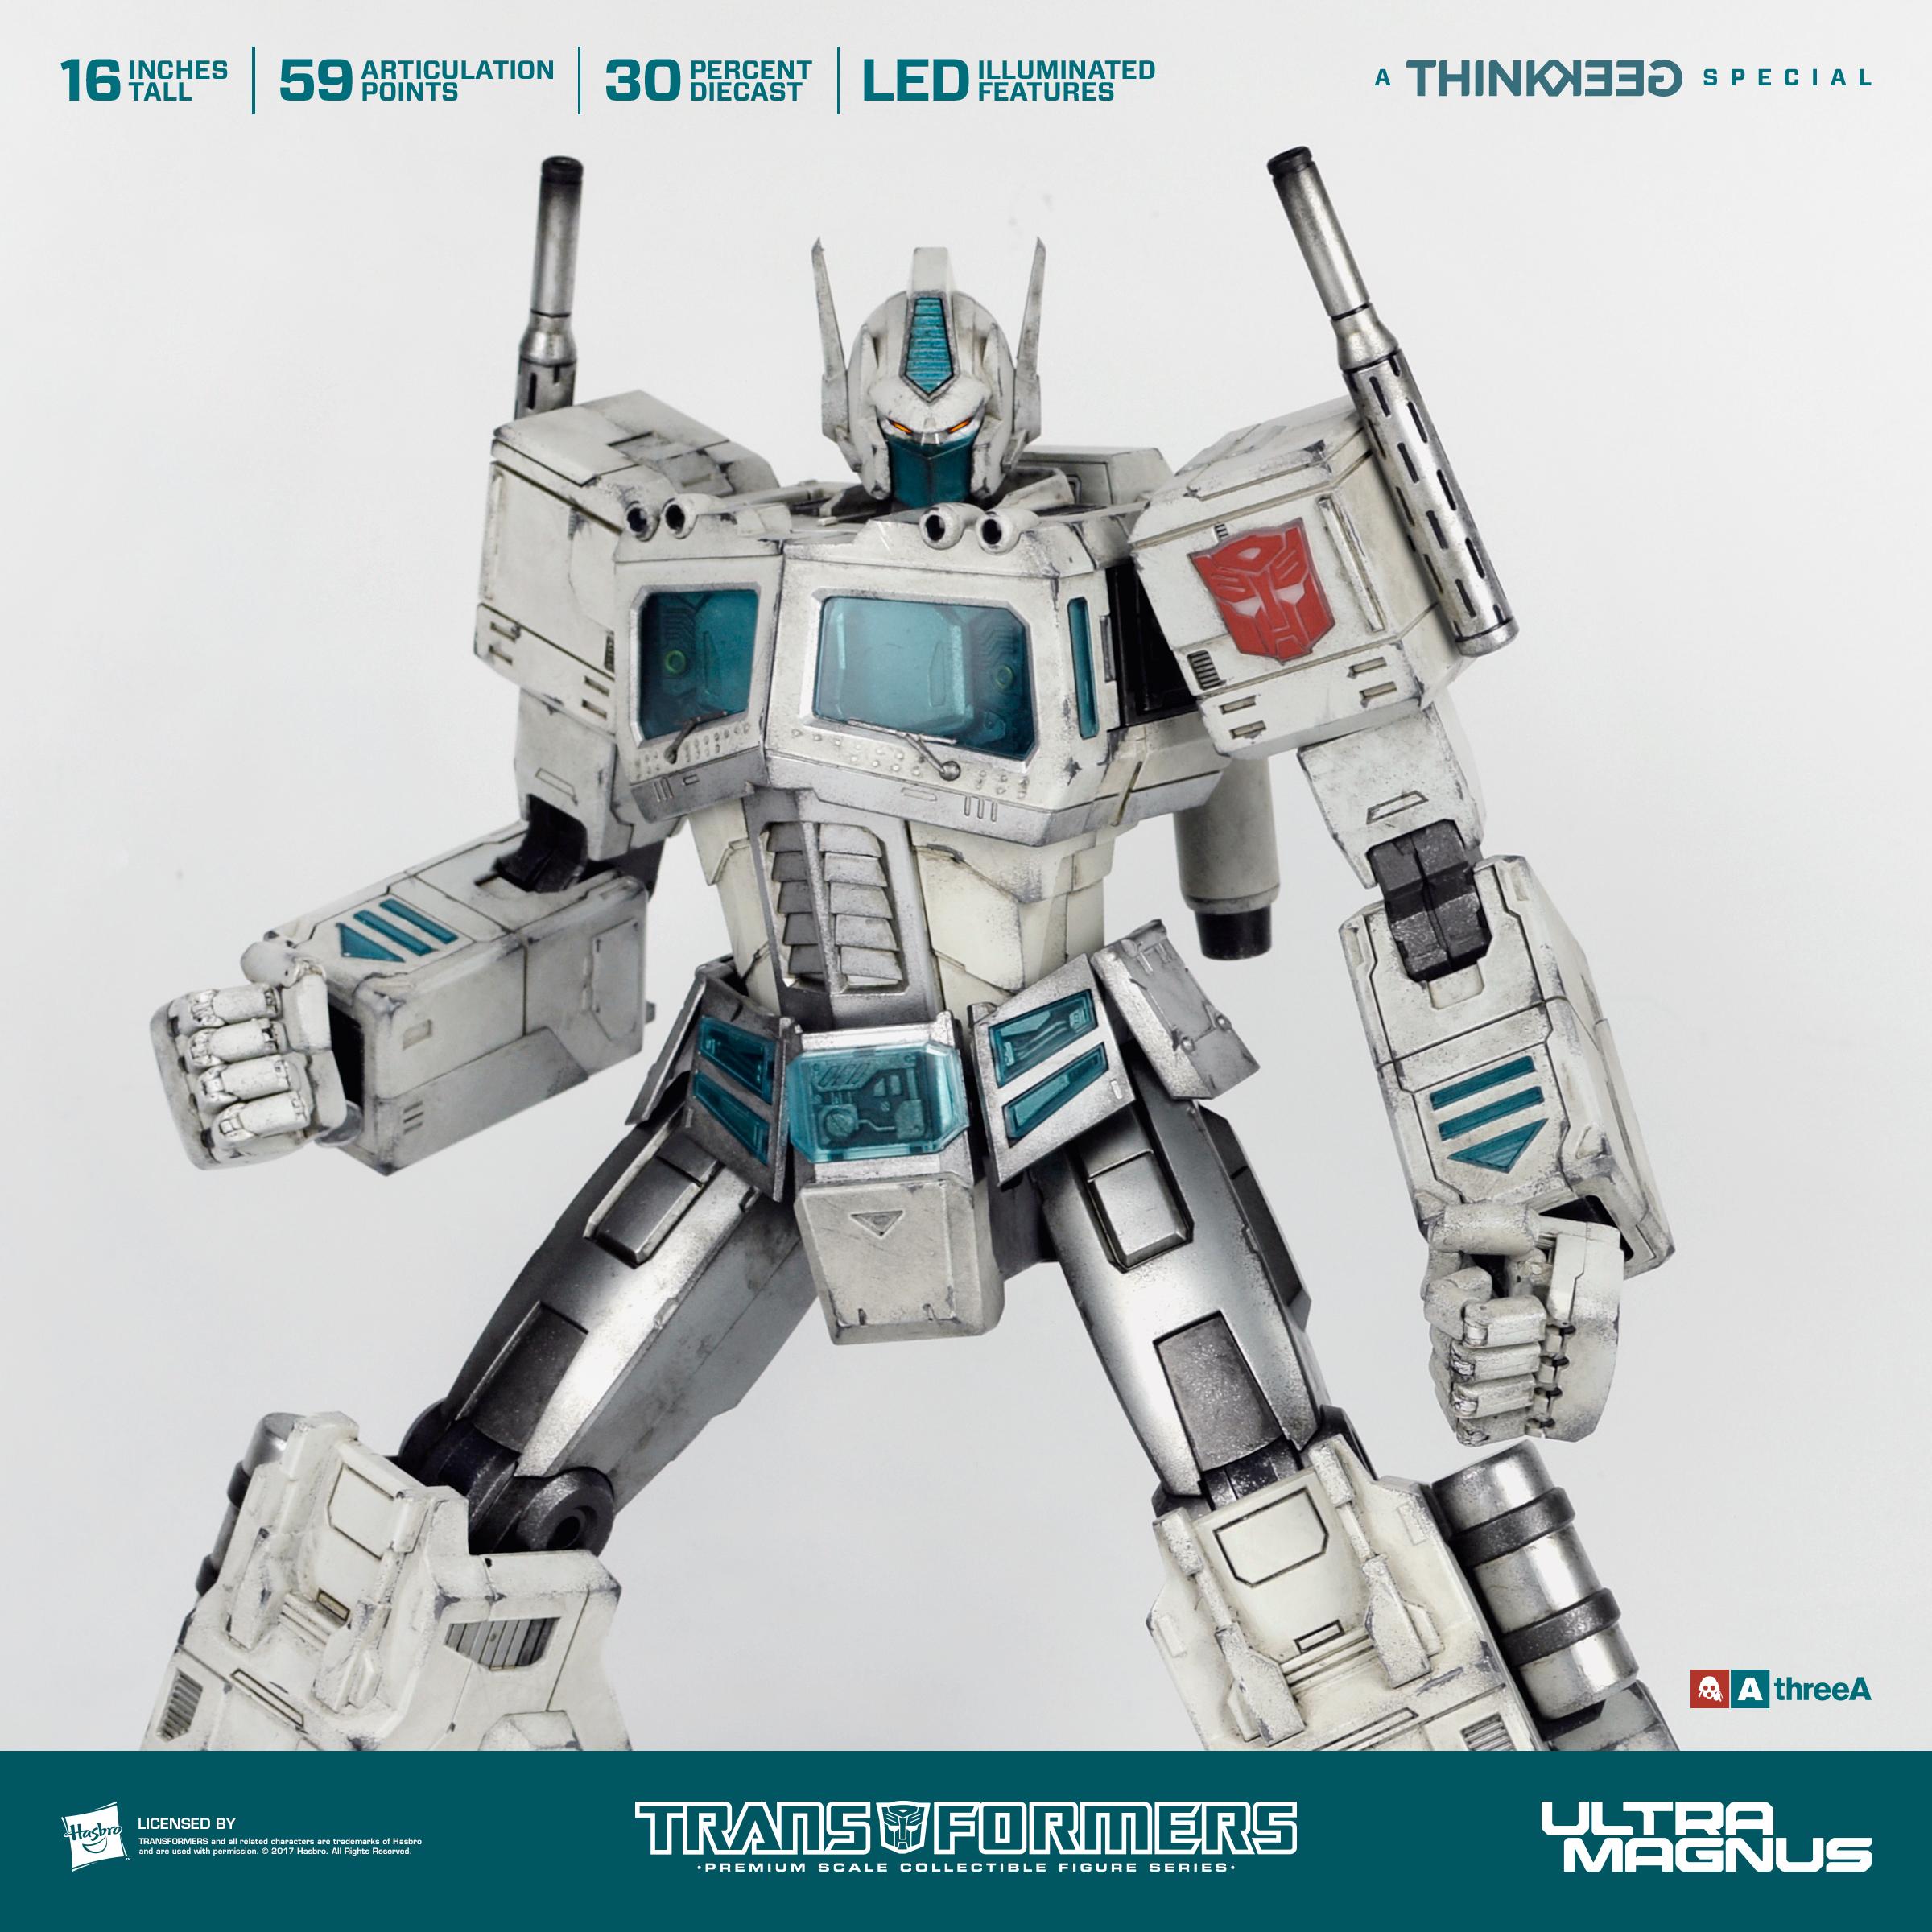 3A_Transformers_G1_UltraMagnus_RetailImages_2400x2400_012.jpg